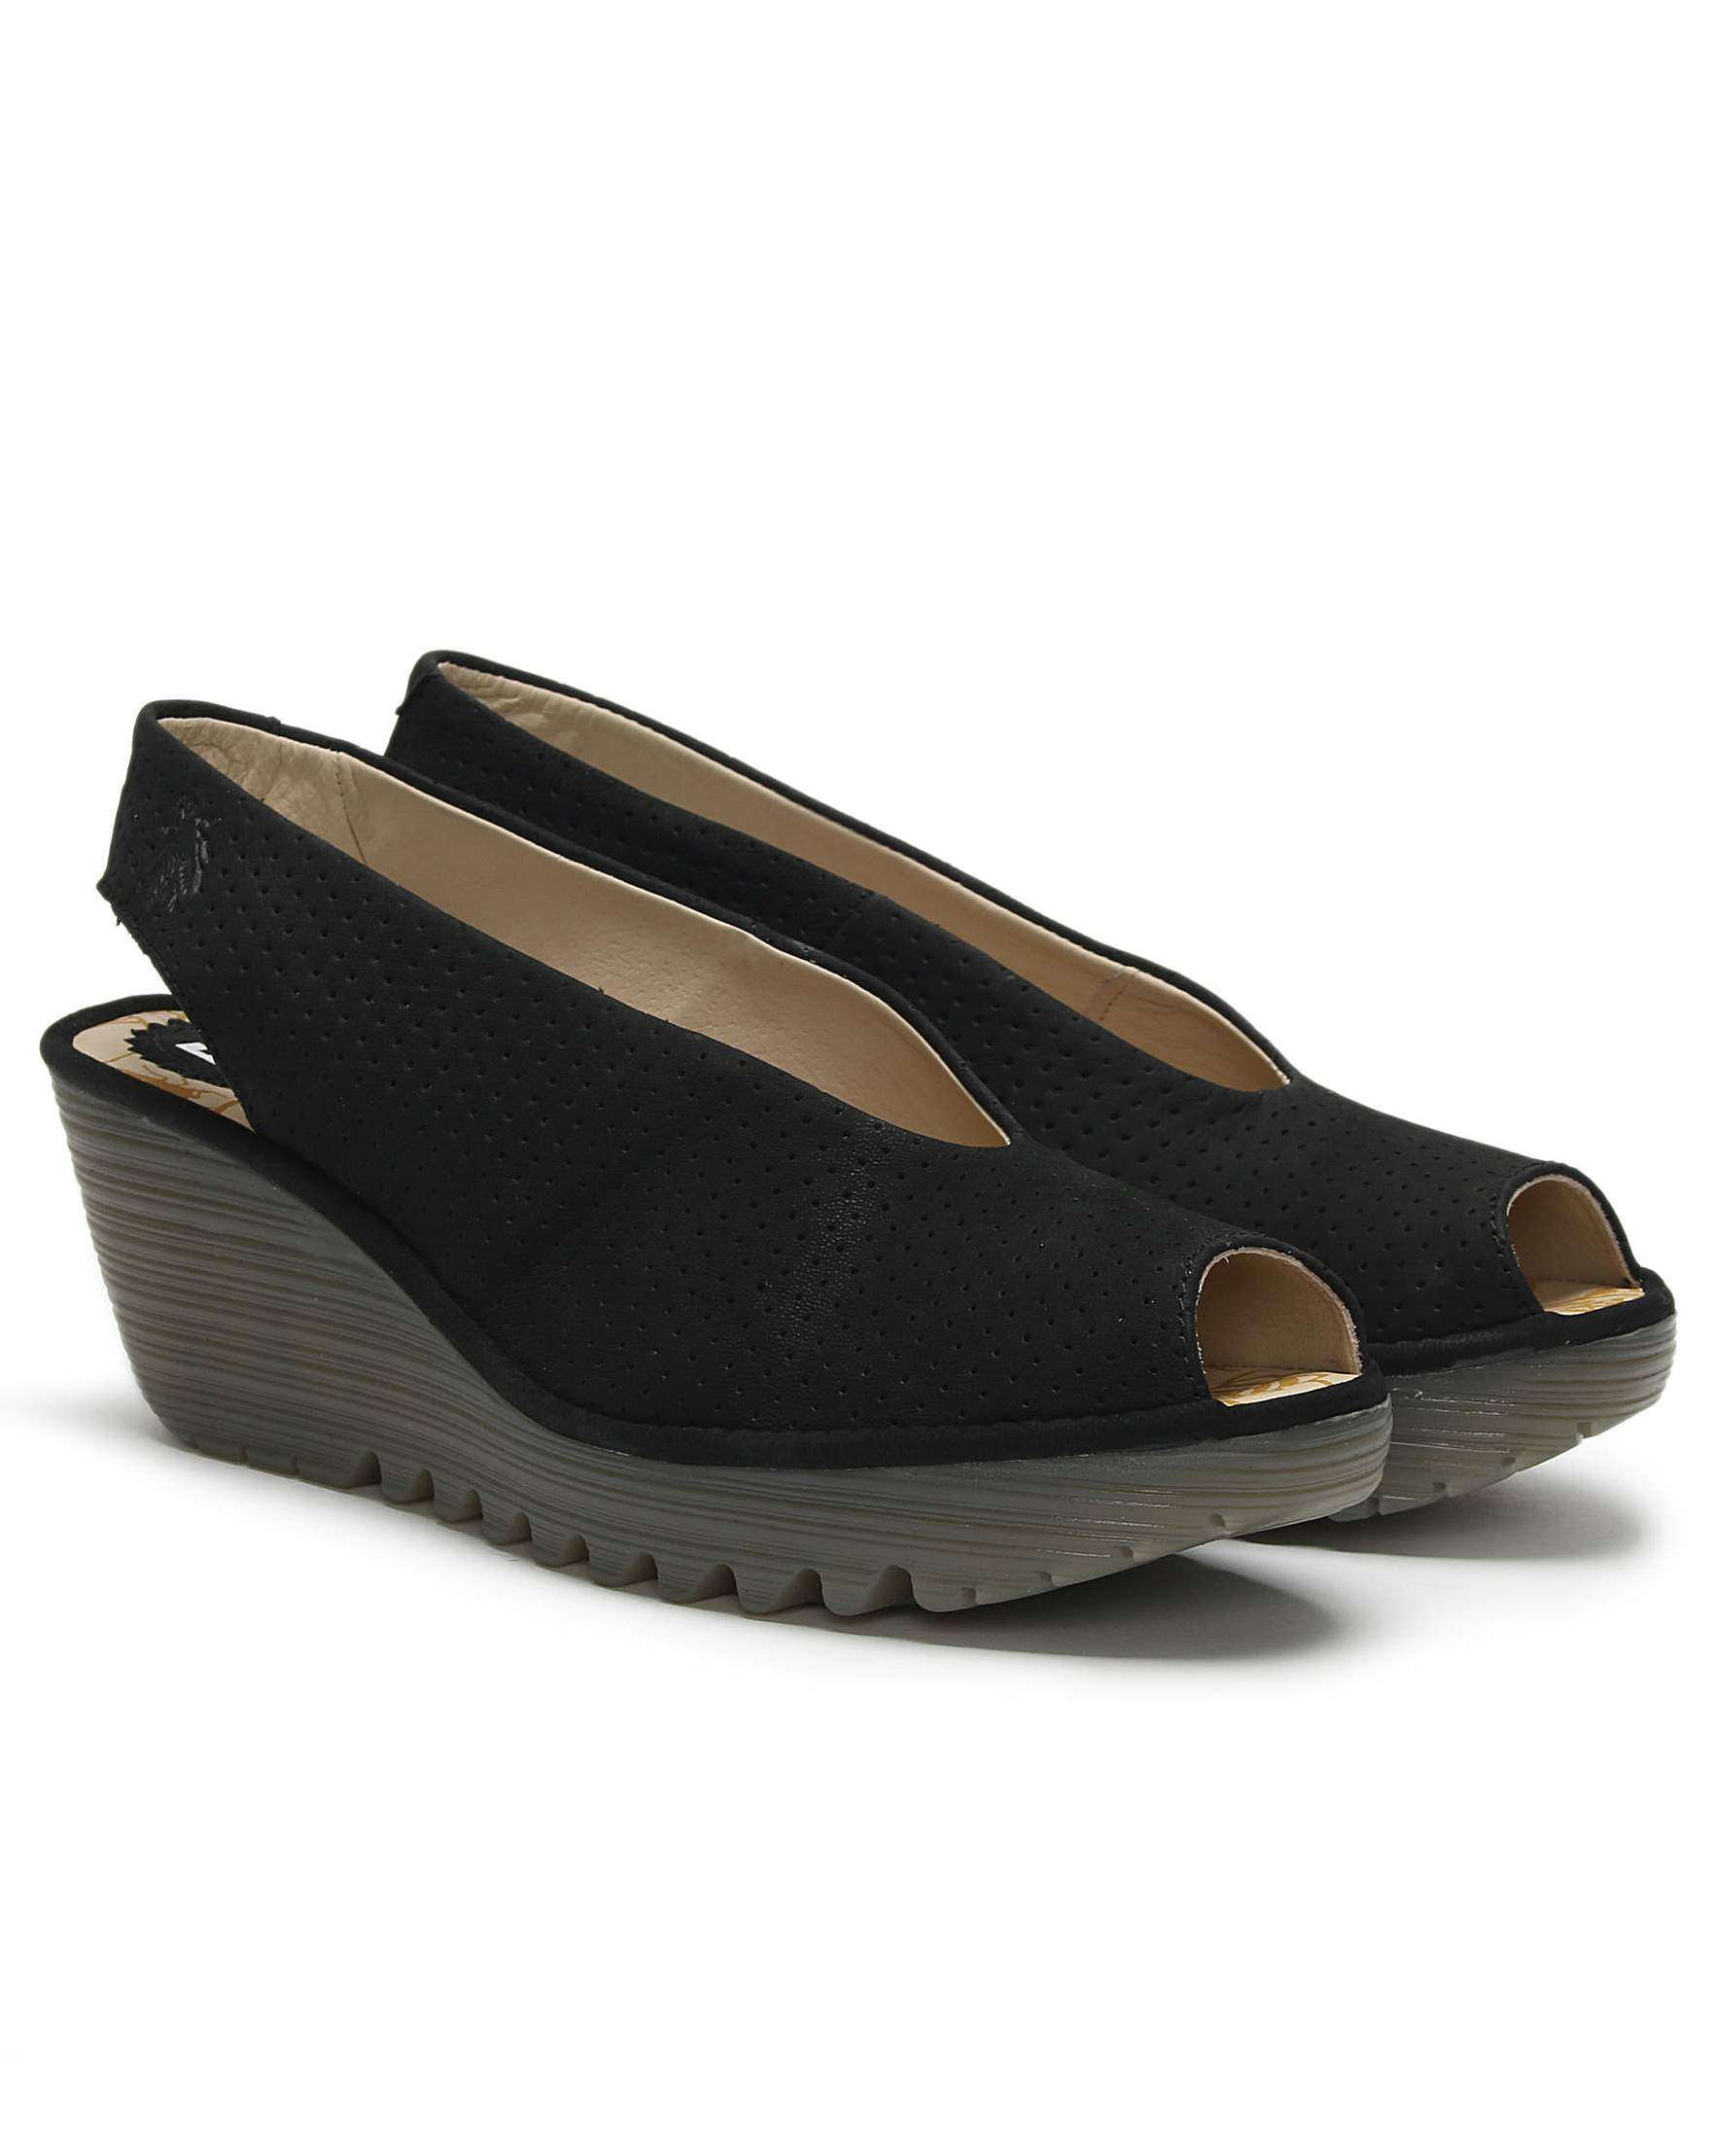 b818652f8db3e Fly London Yazu Sling Back Wedge Sandals | Simply Be